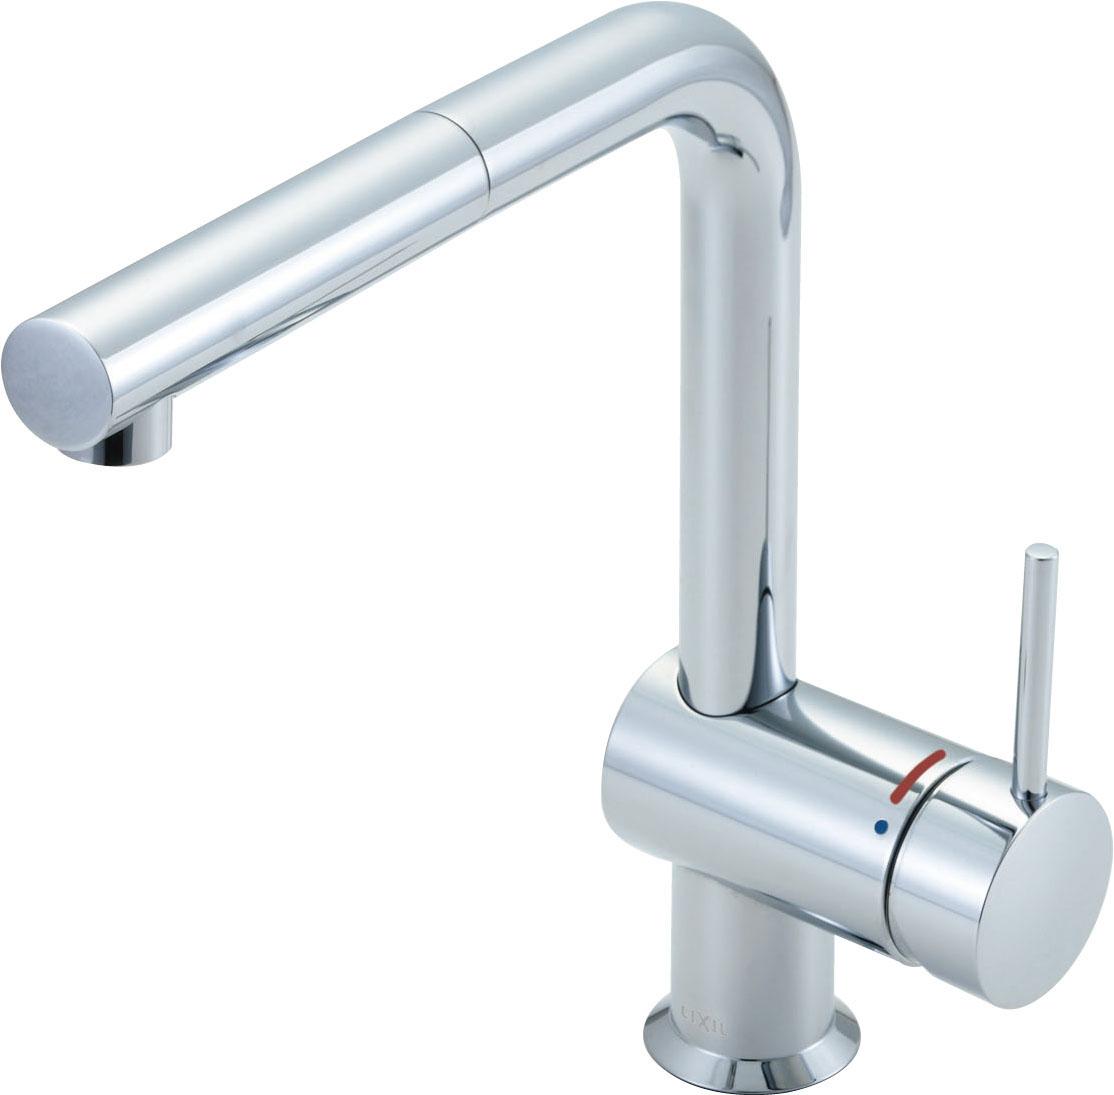 LIXIL リクシル 【SF-E546SY】 シリーズ名: eモダンLタイプ 品名: 吐水口引出式シングルレバー混合水栓[新品]